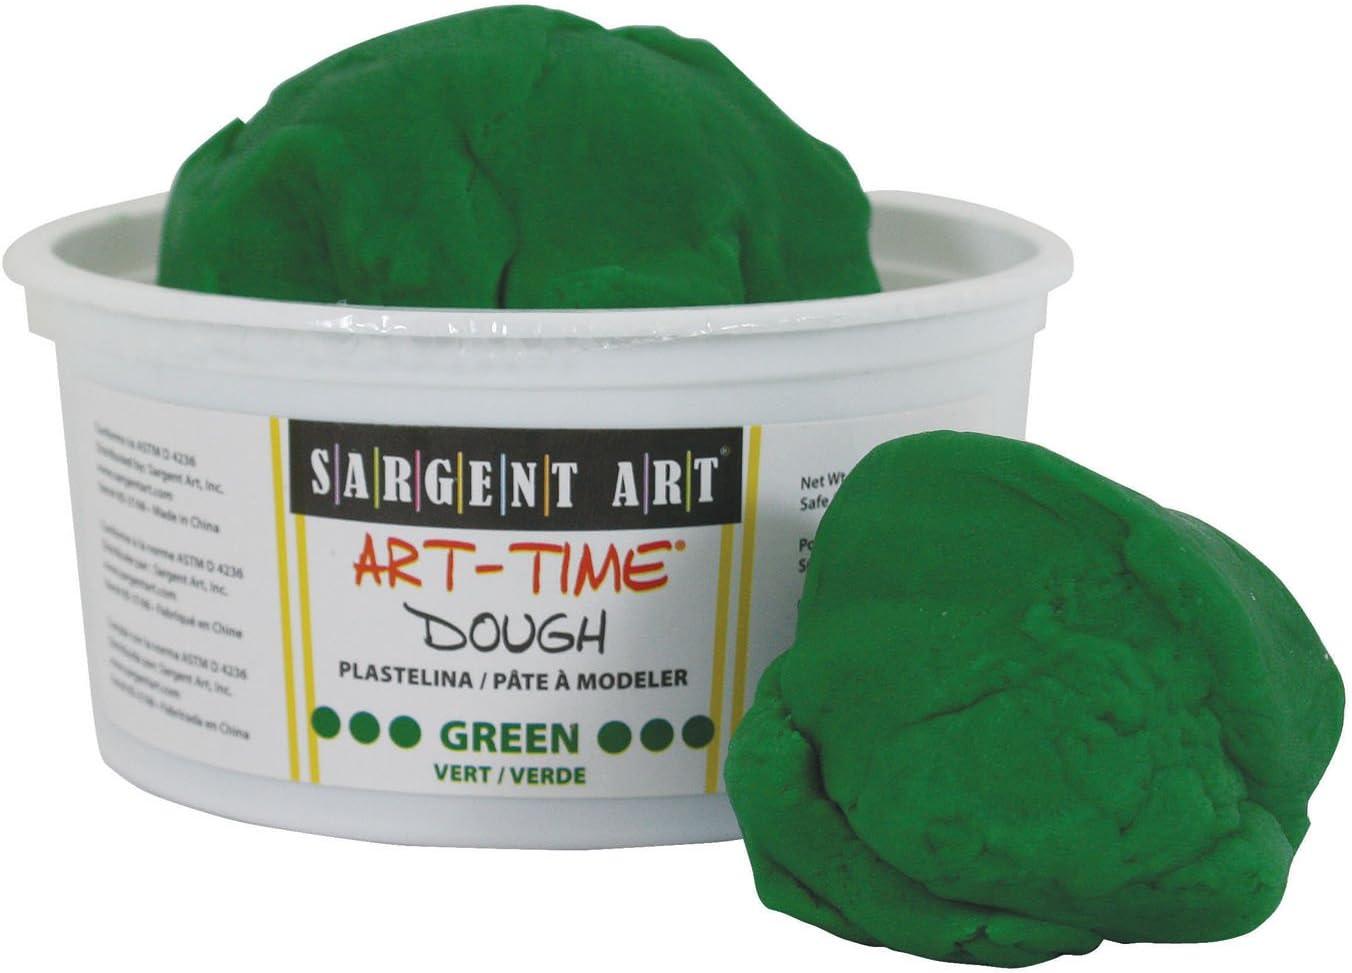 Sargent Art 85-3166 1-Pound Mail order cheap Boston Mall Art-Time Dough Green